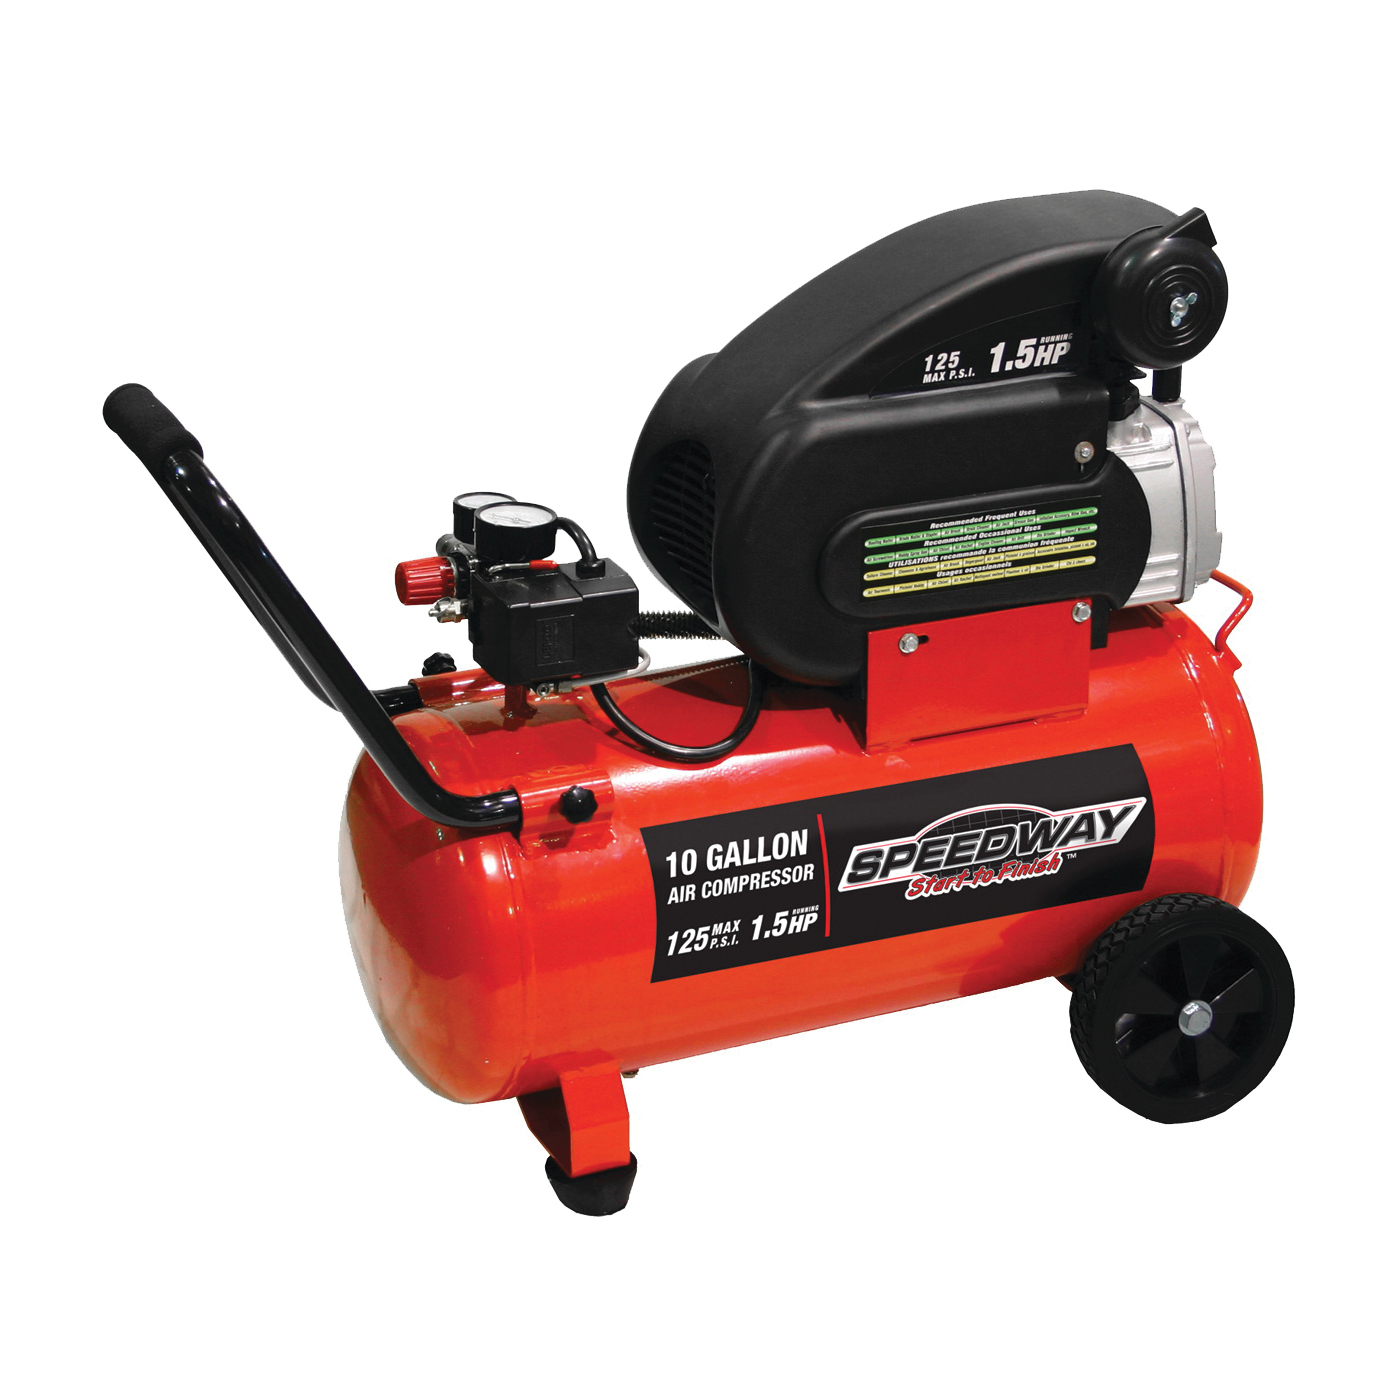 Picture of Speedway 52956 Air Compressor, 10 gal Tank, 1.5 hp, 125 psi Pressure, 6 cfm Air